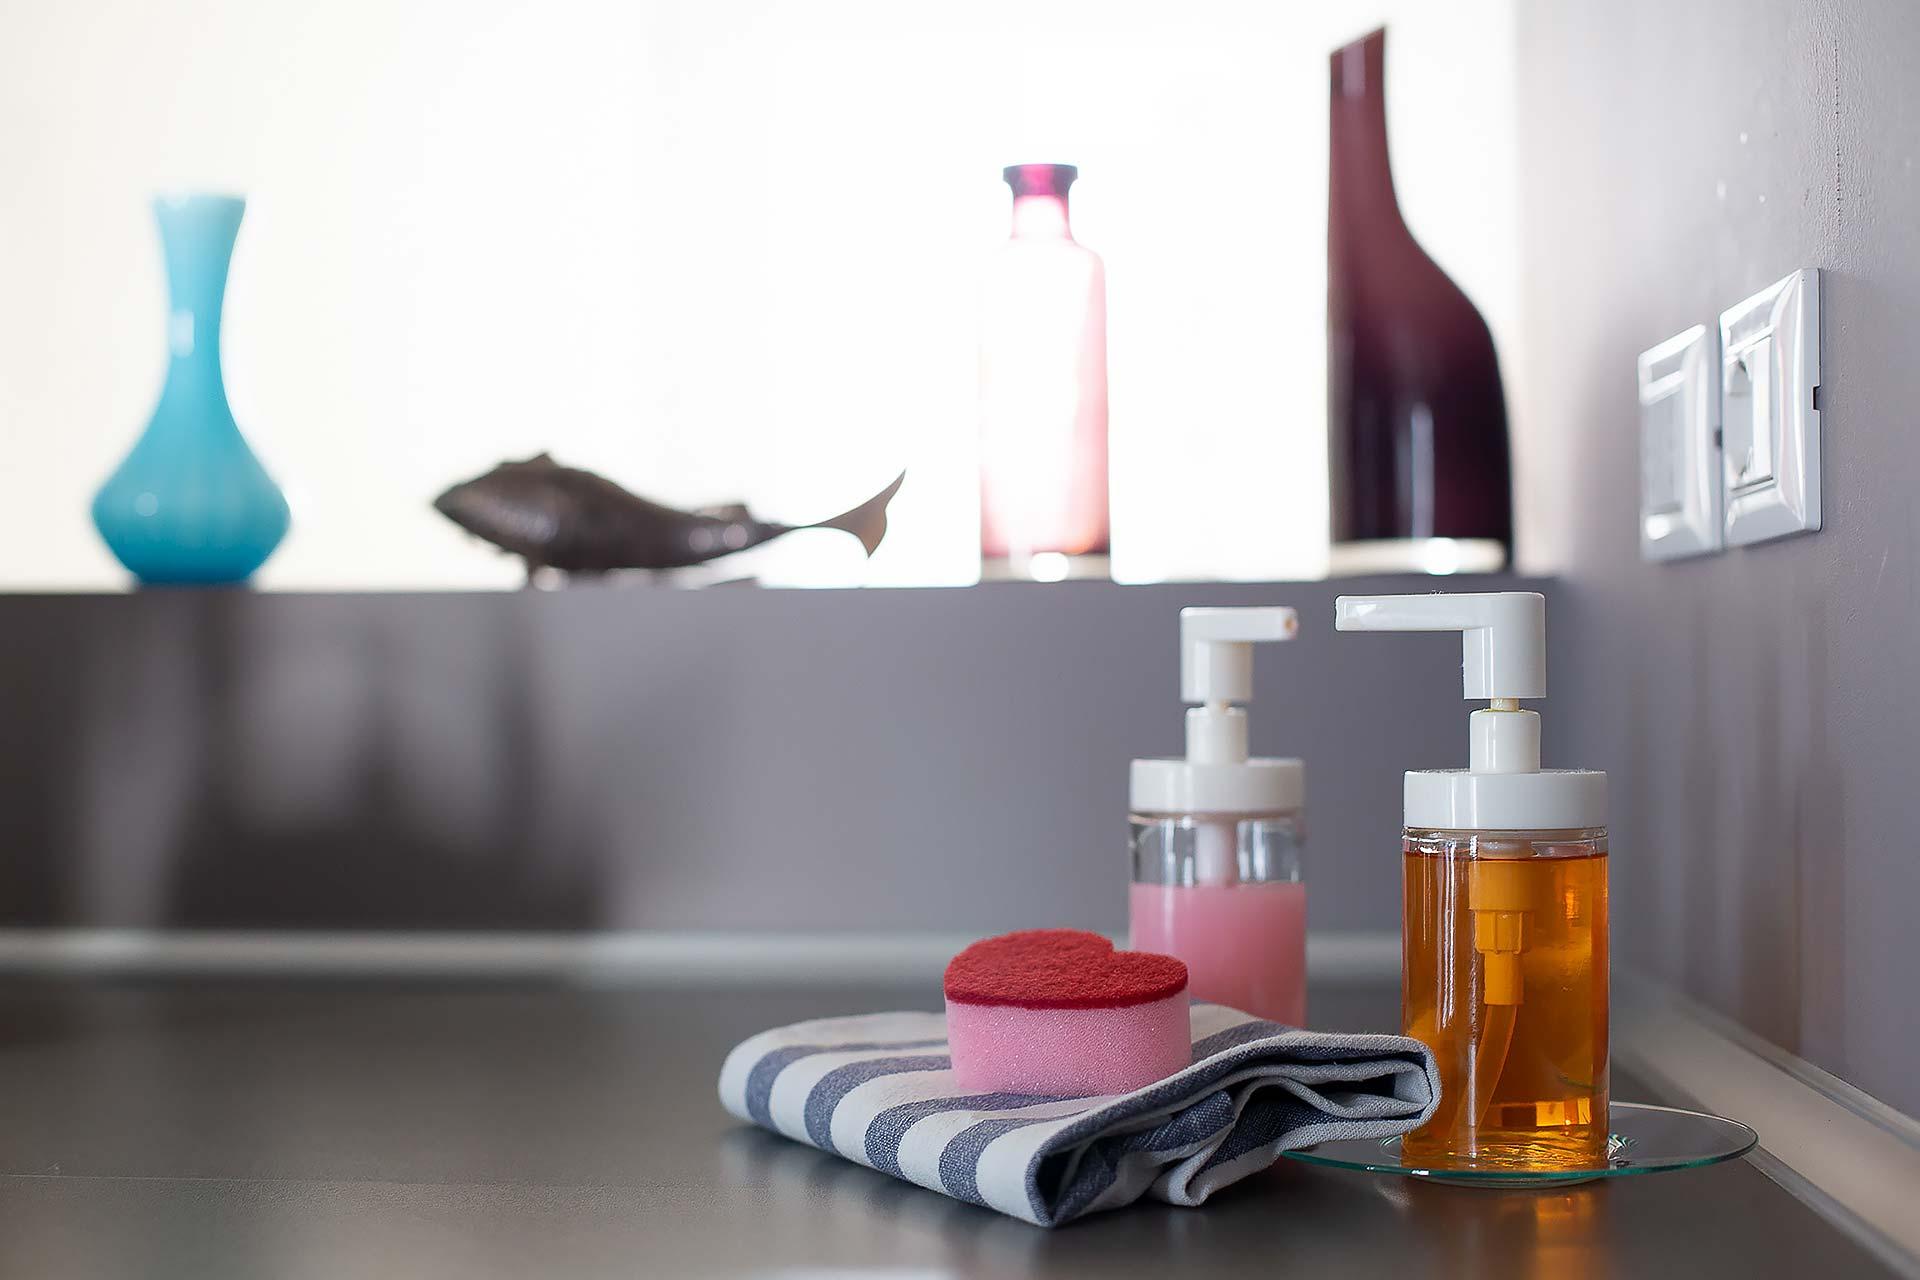 fotografo-airbnb-booking-case-Treviso-Venezia-particolare-cucina